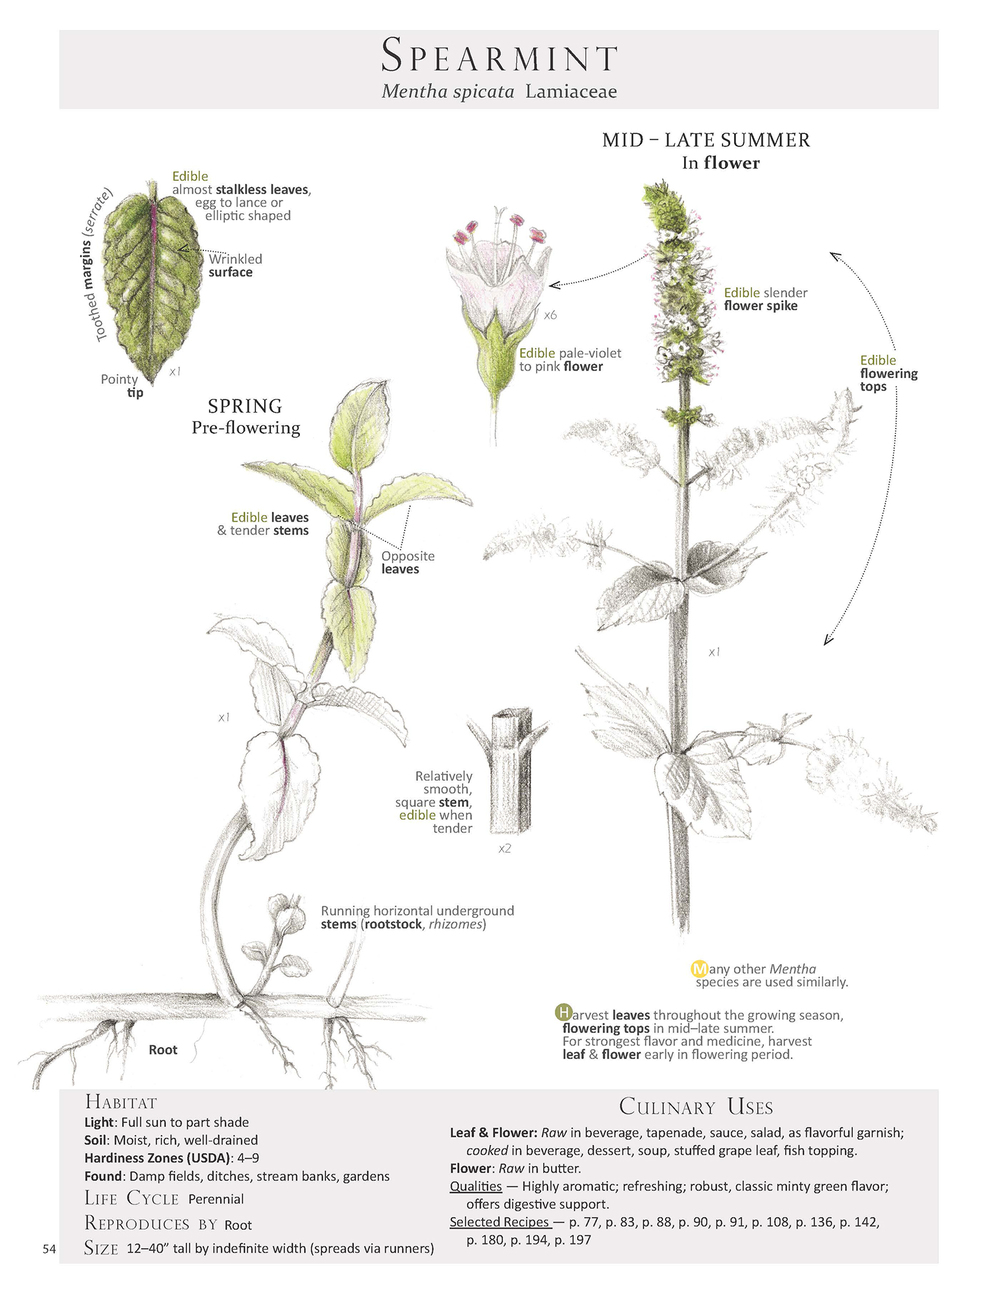 Spearmint - Mentha spicata